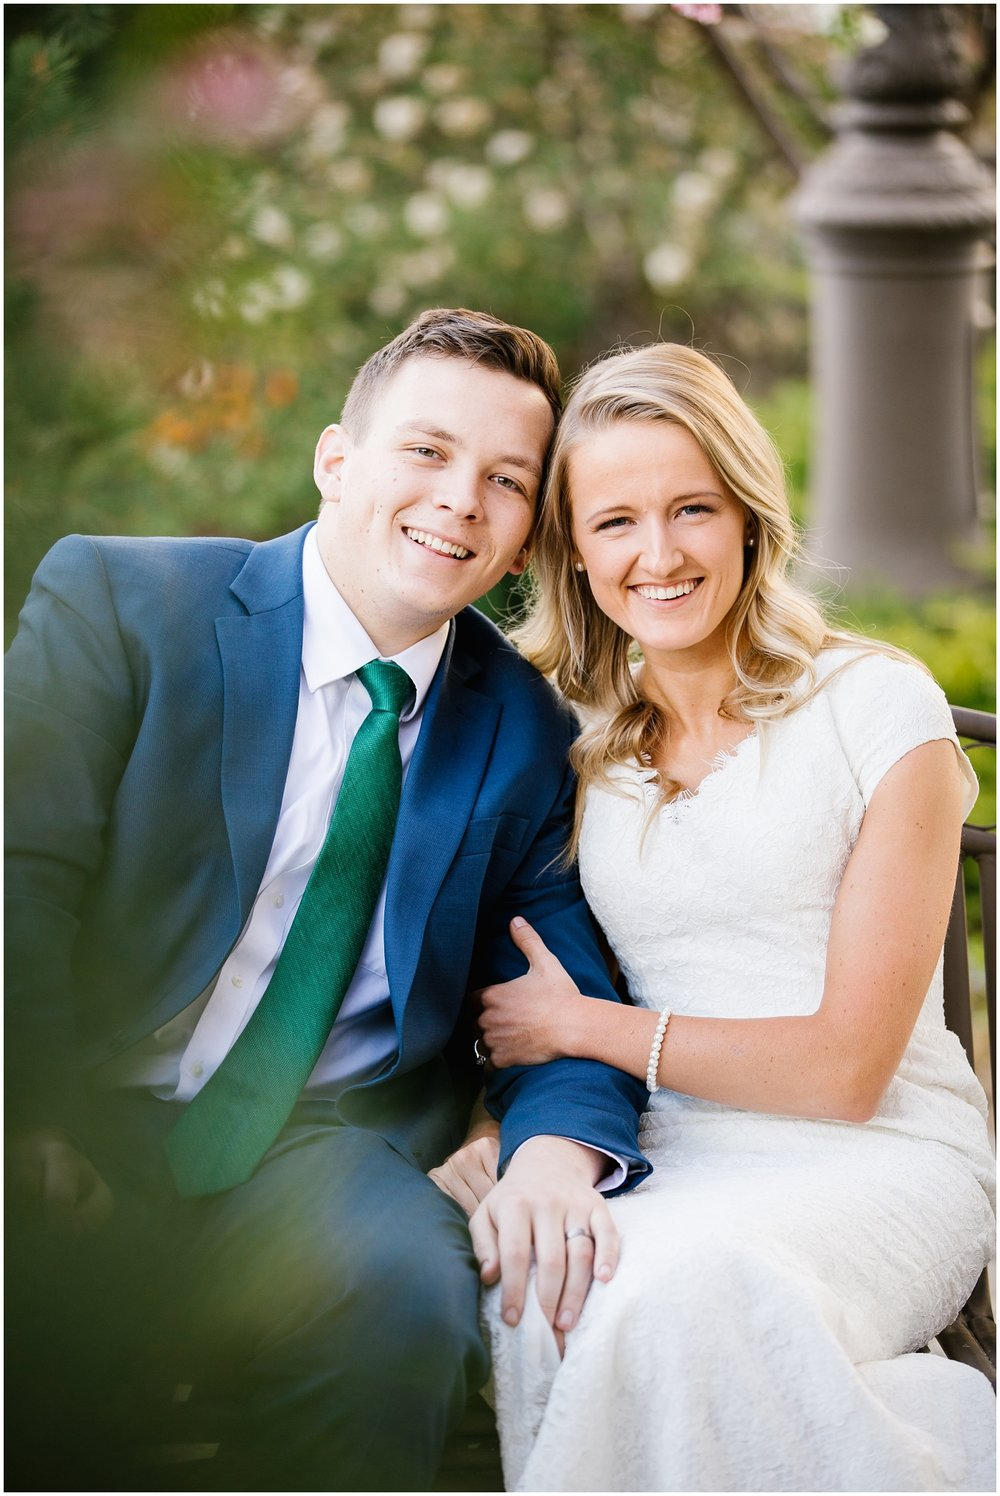 TA-Bridals-6_Lizzie-B-Imagery-Utah-Wedding-Photographer-Park-City-Salt-Lake-City-Thanksgiving-Point-Ashton-Gardens-Lehi-Utah.jpg